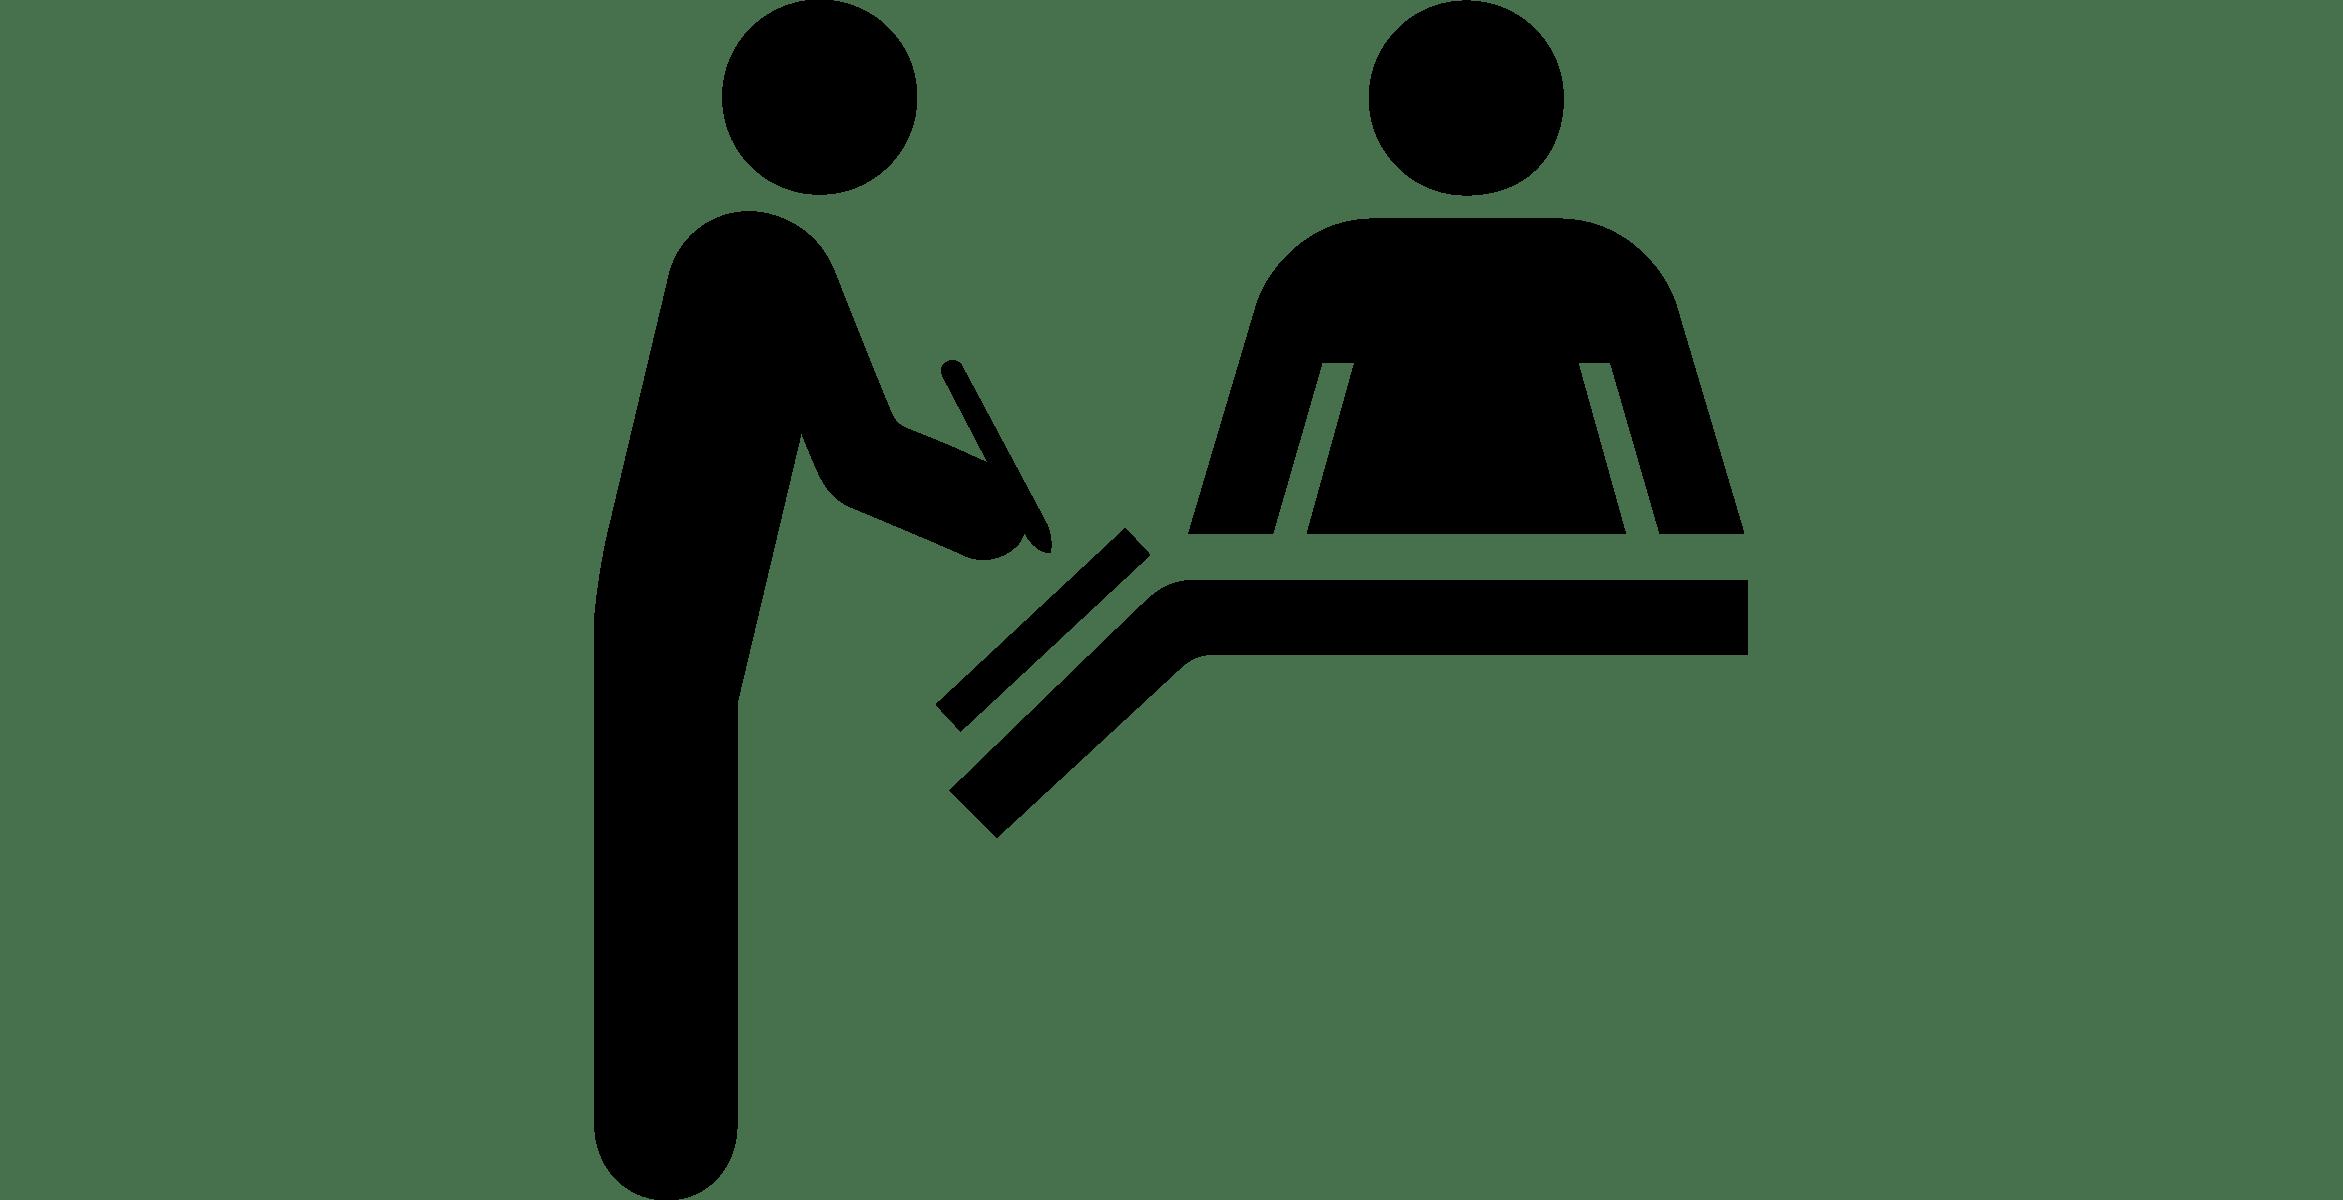 Receptionist clipart patient registration, Receptionist